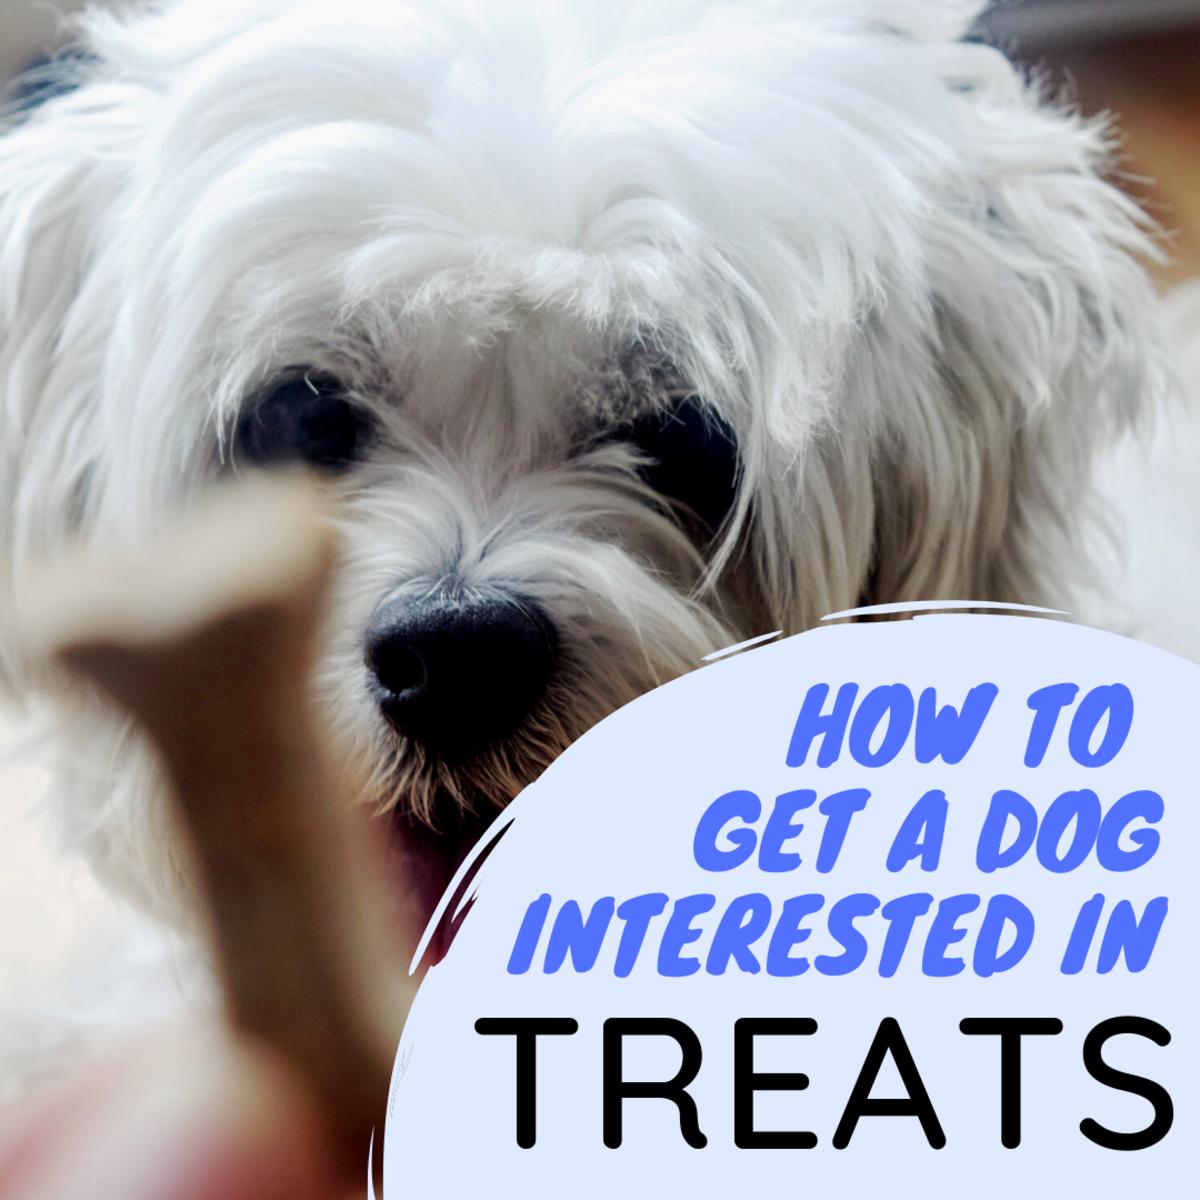 Why Won't My Dog Respond to Treats?